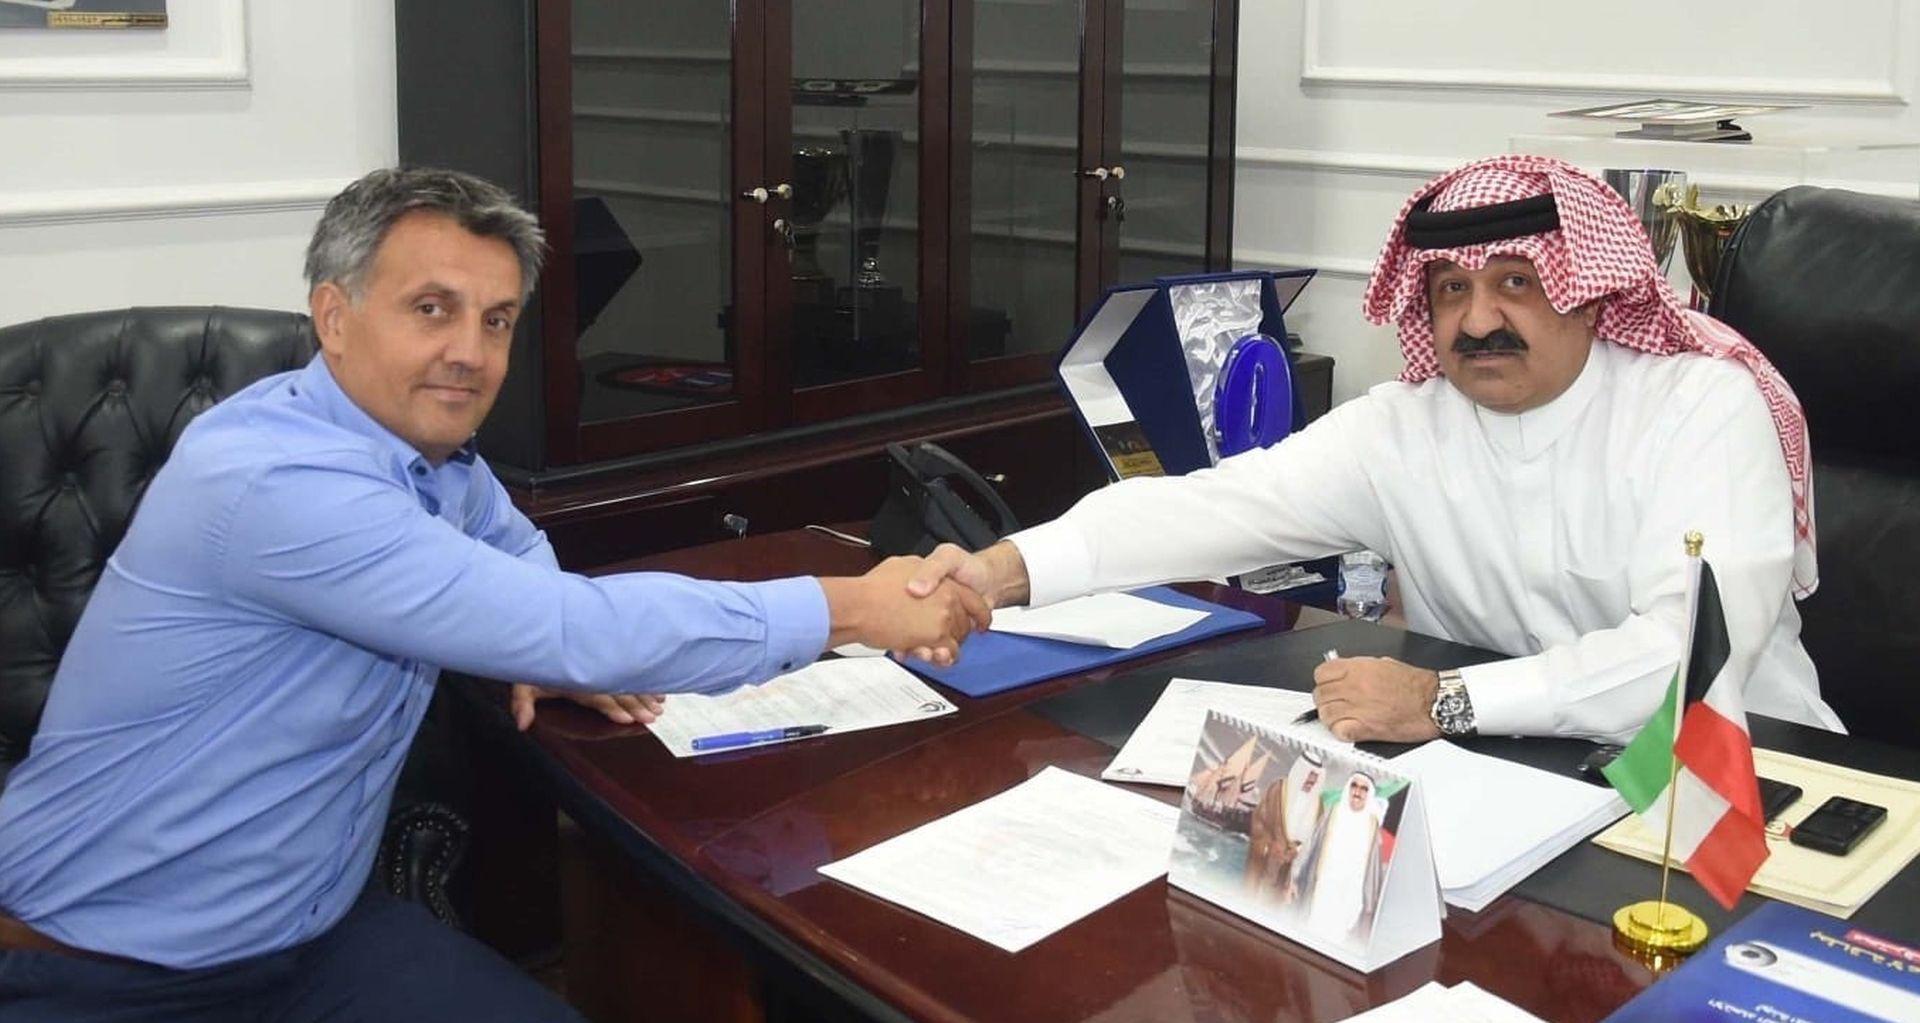 Romeo Jozak novi izbornik Kuvajta